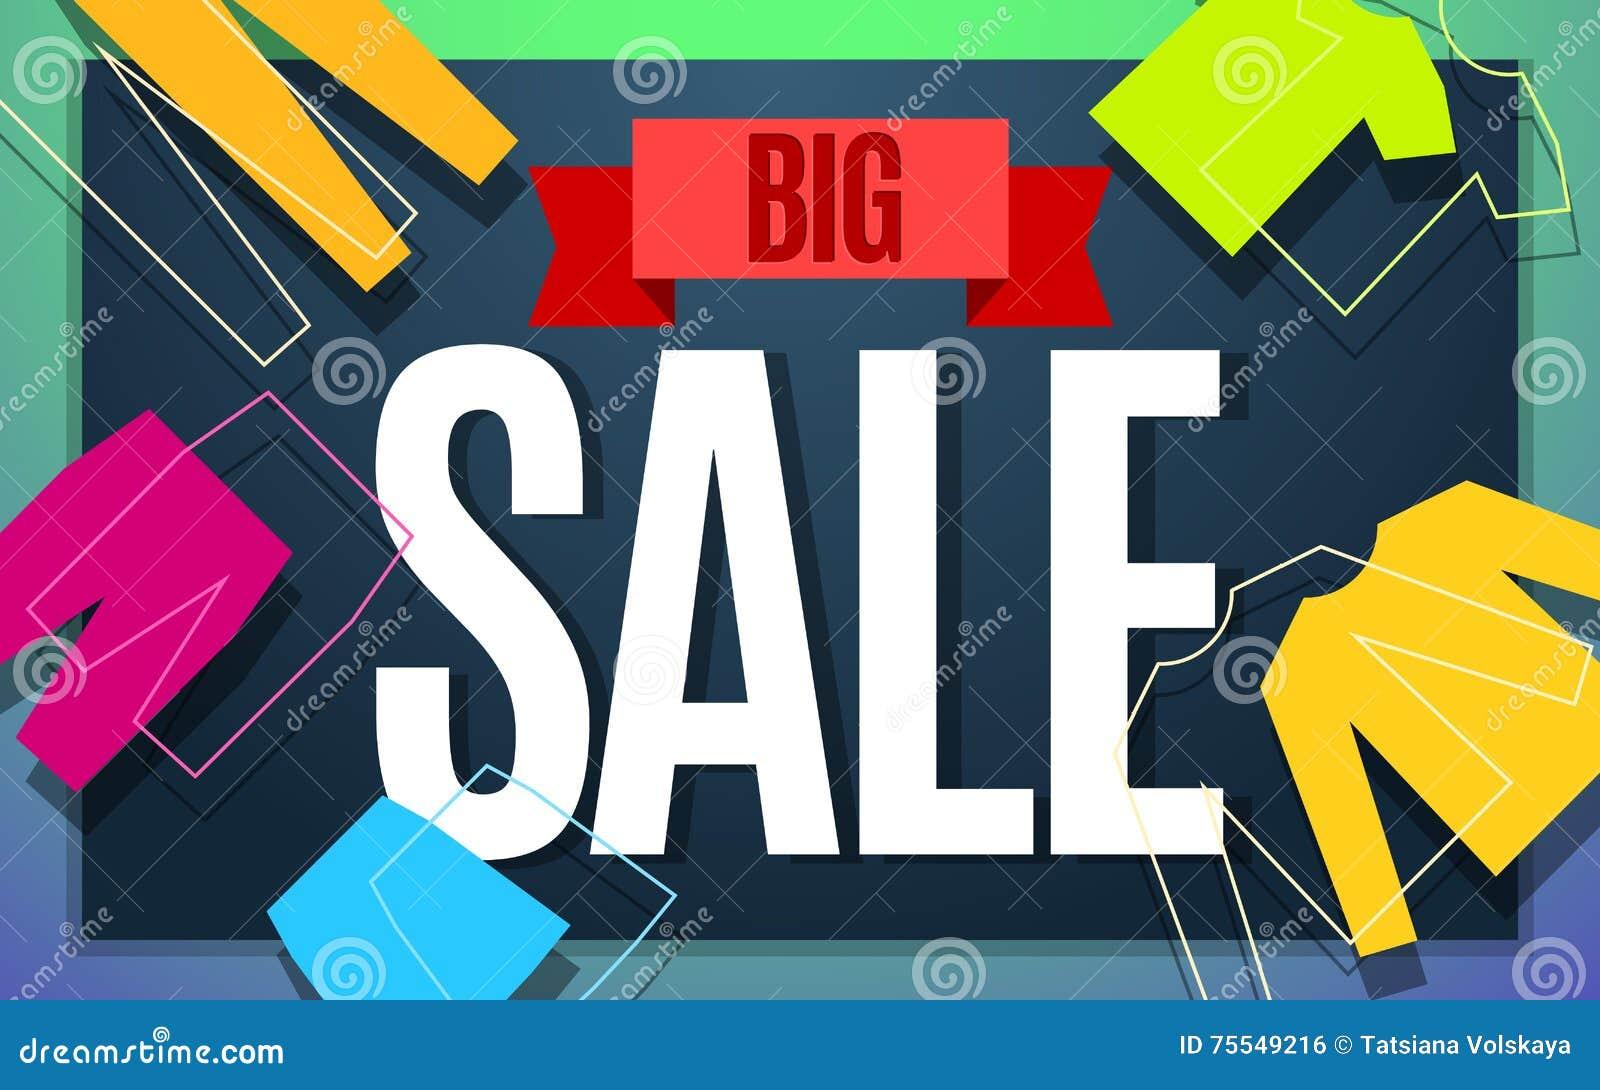 big clothes sale banner design  stock vector